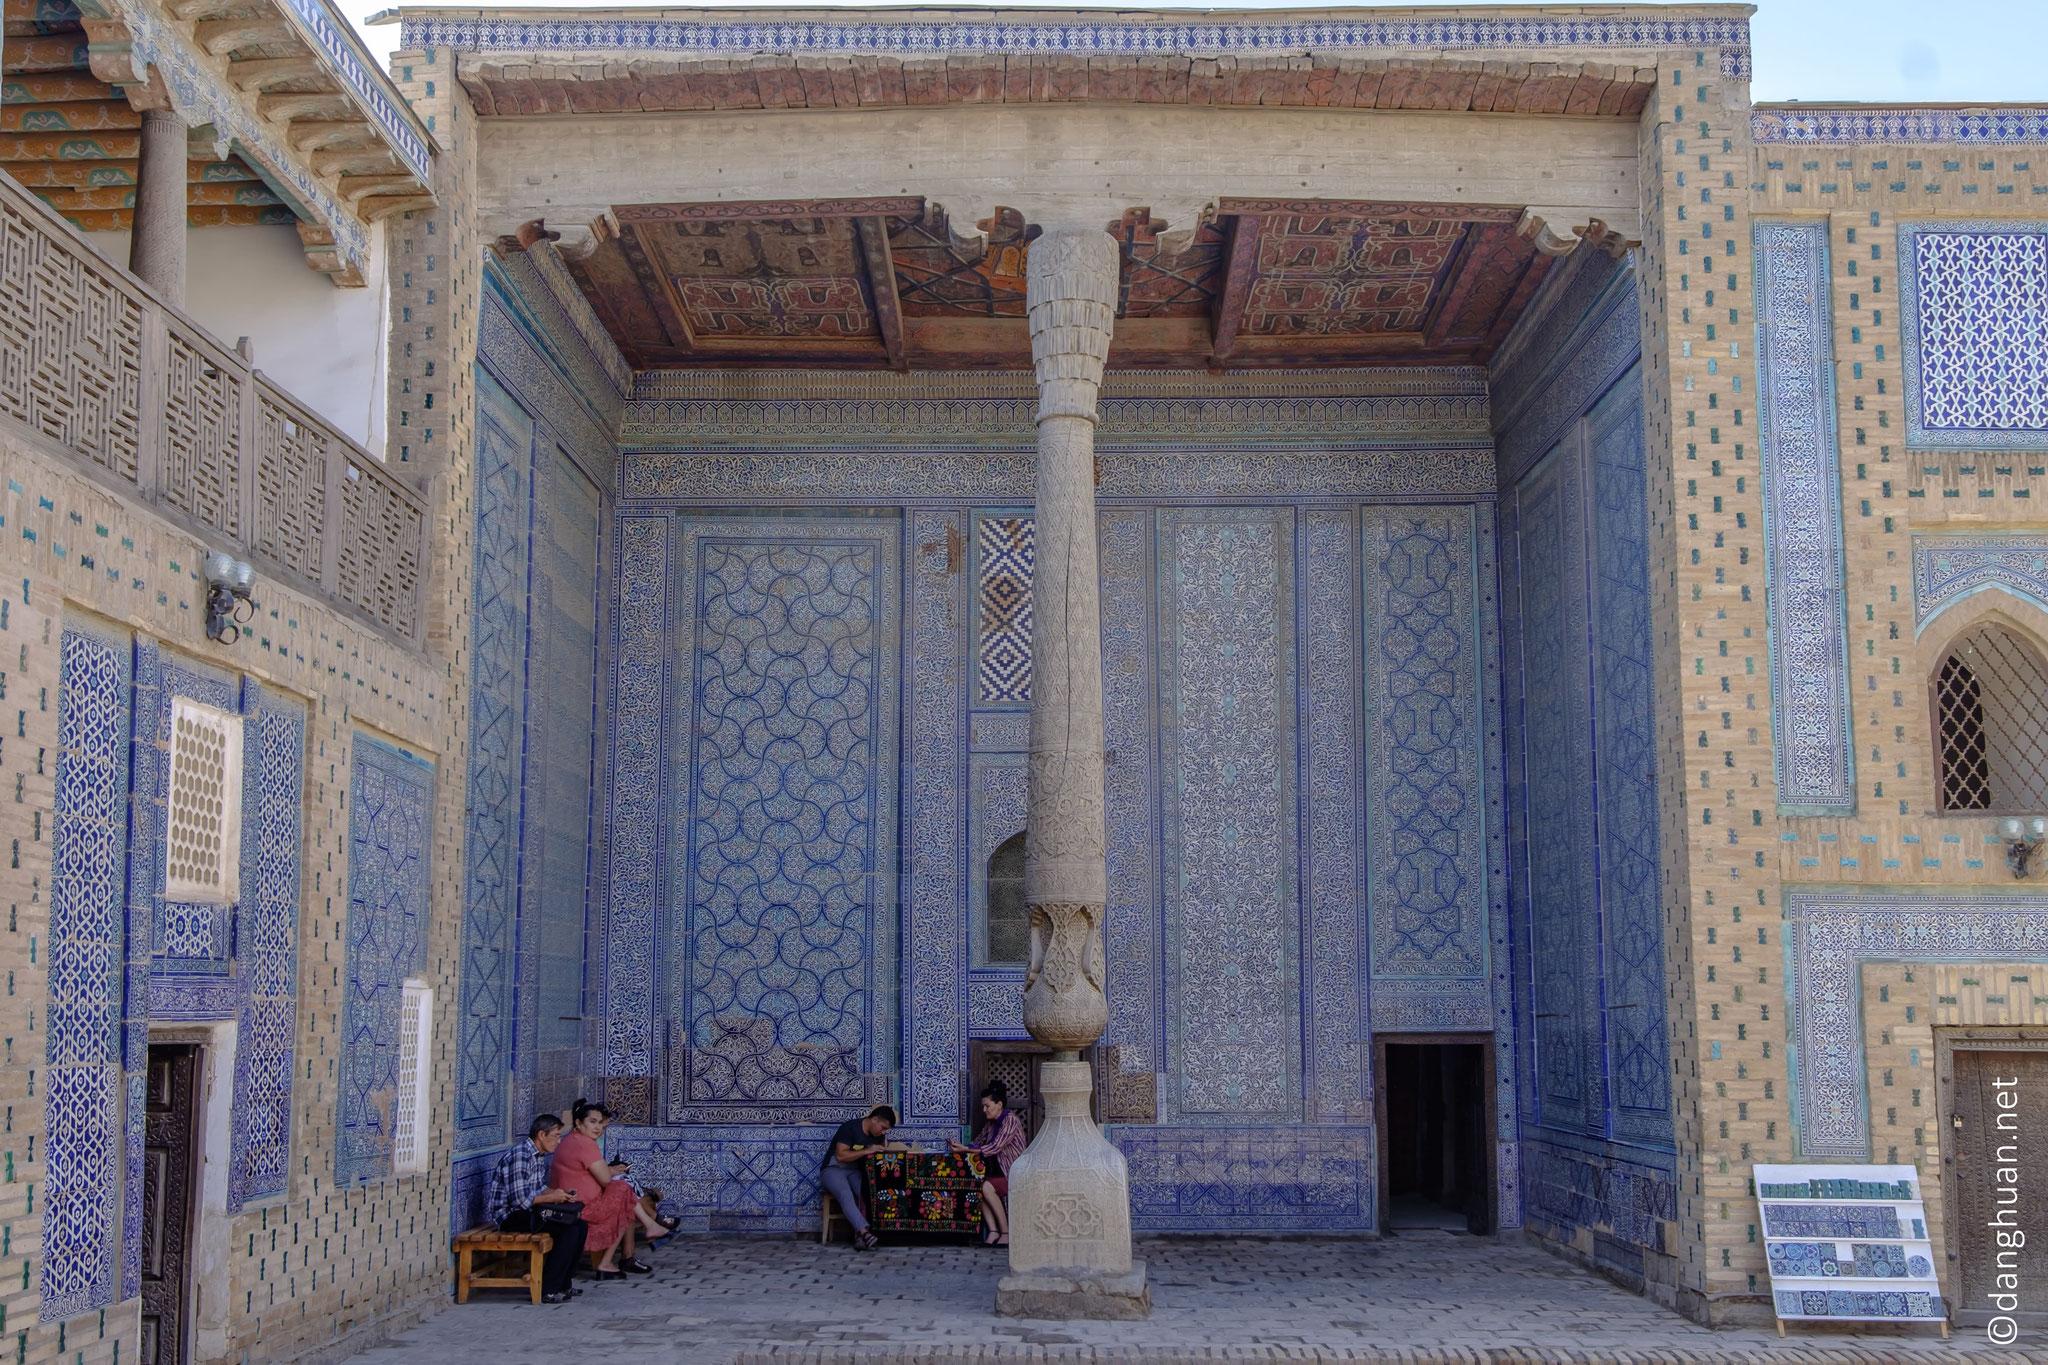 Iwan du palais